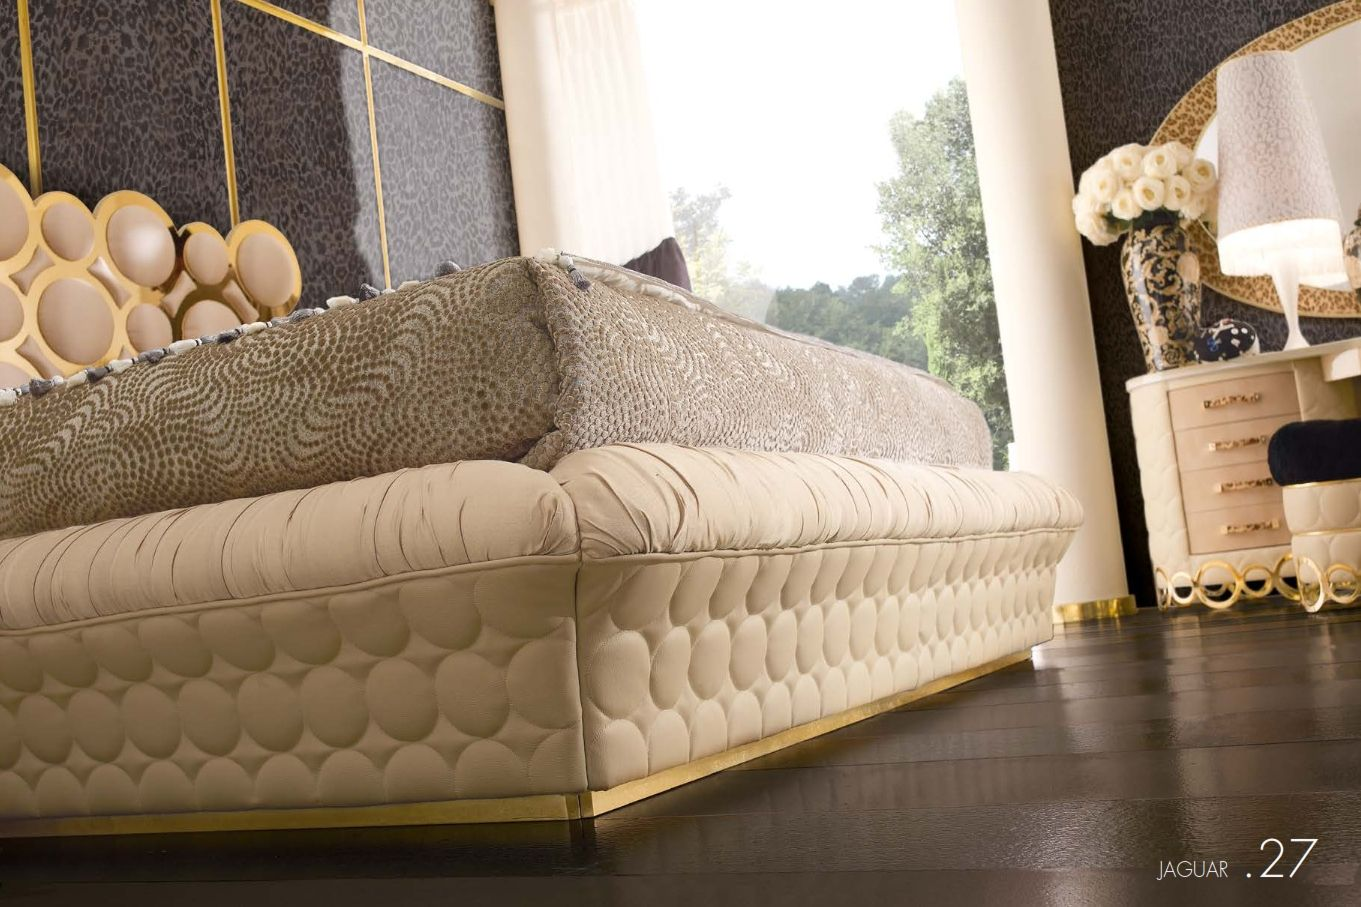 Luxurious Furniture Luxury Bedroom Alta Moda Jaguar